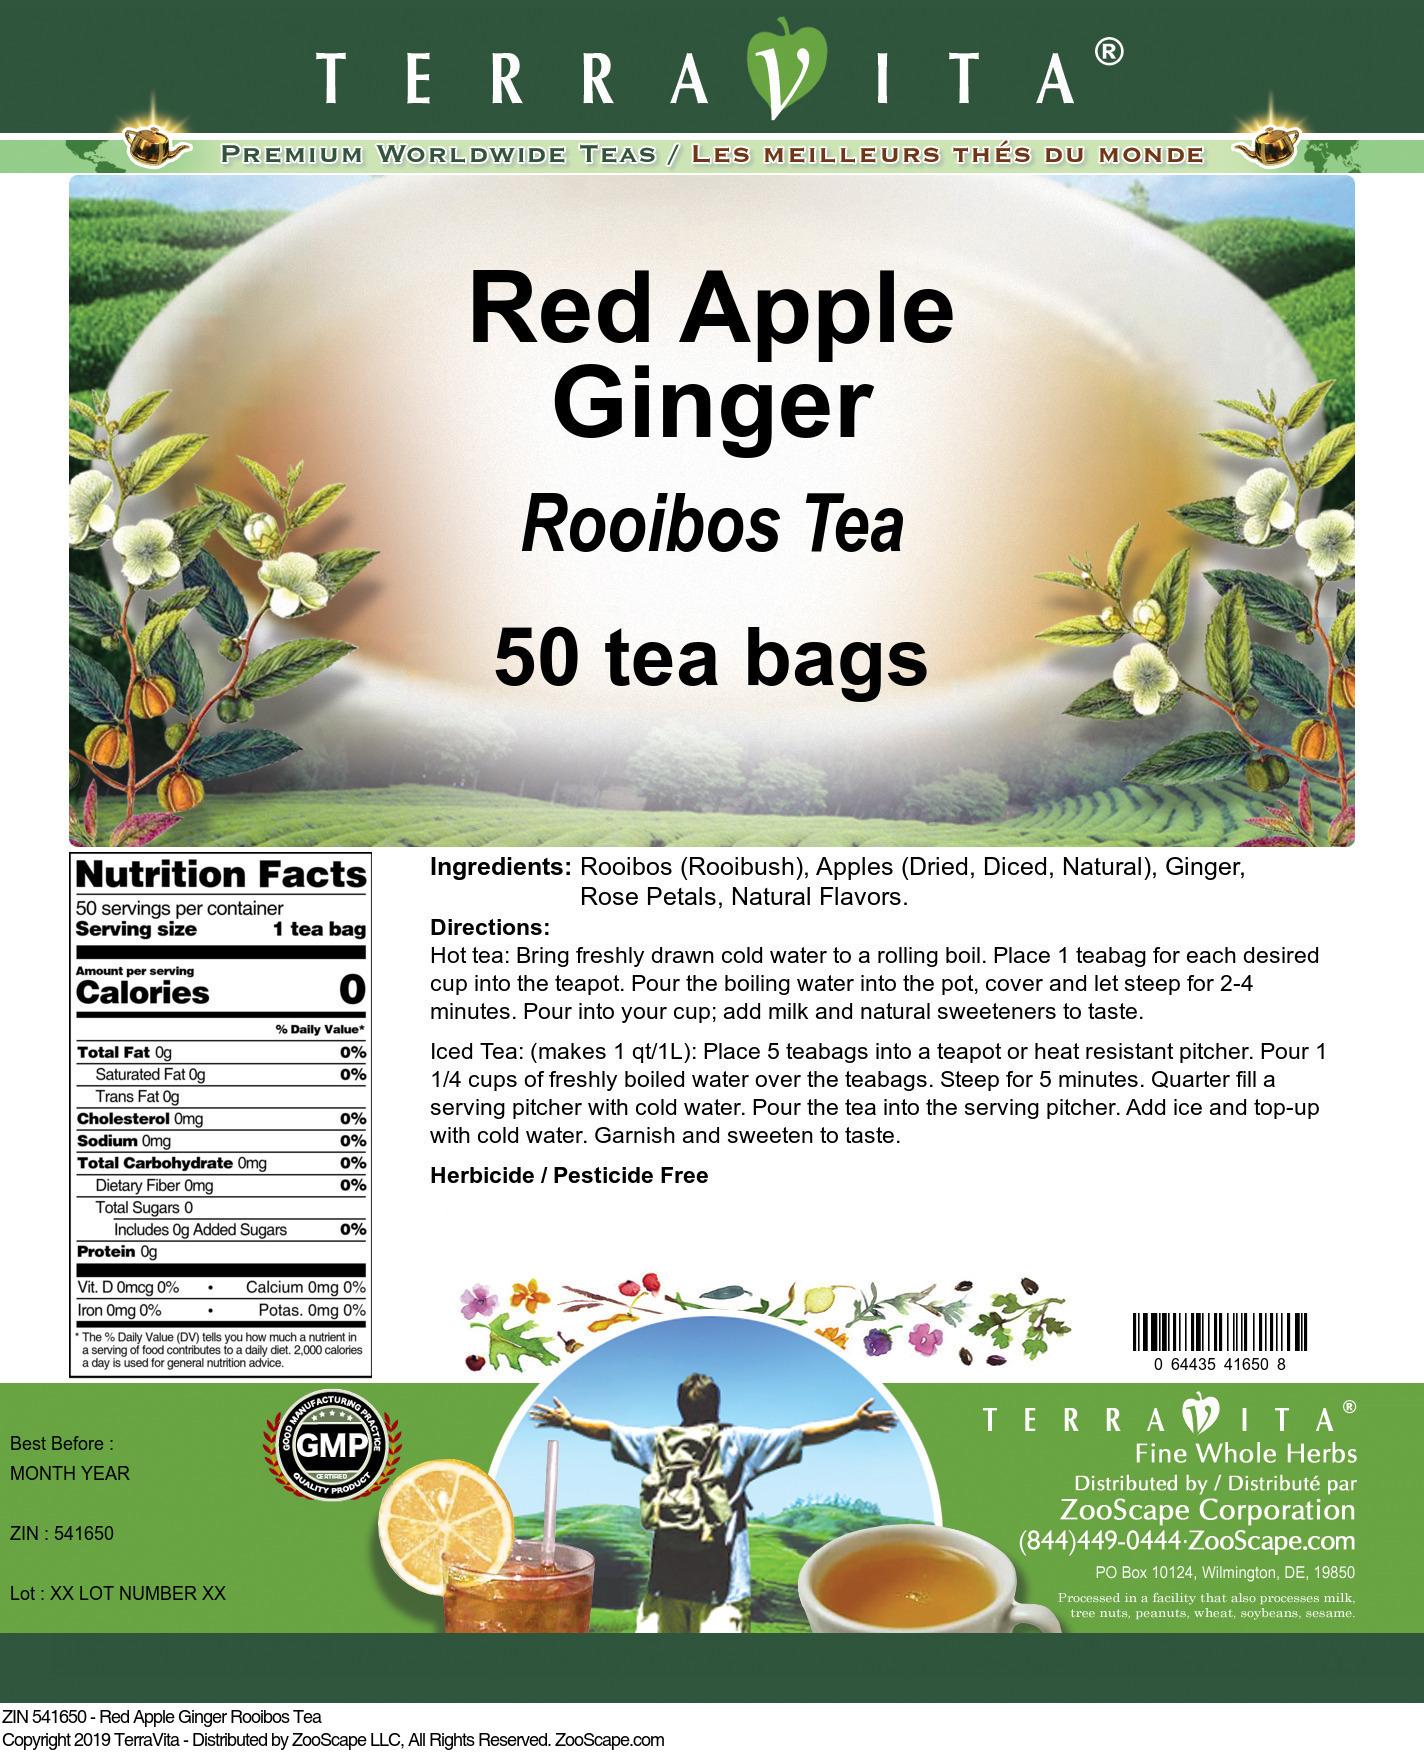 Red Apple Ginger Rooibos Tea